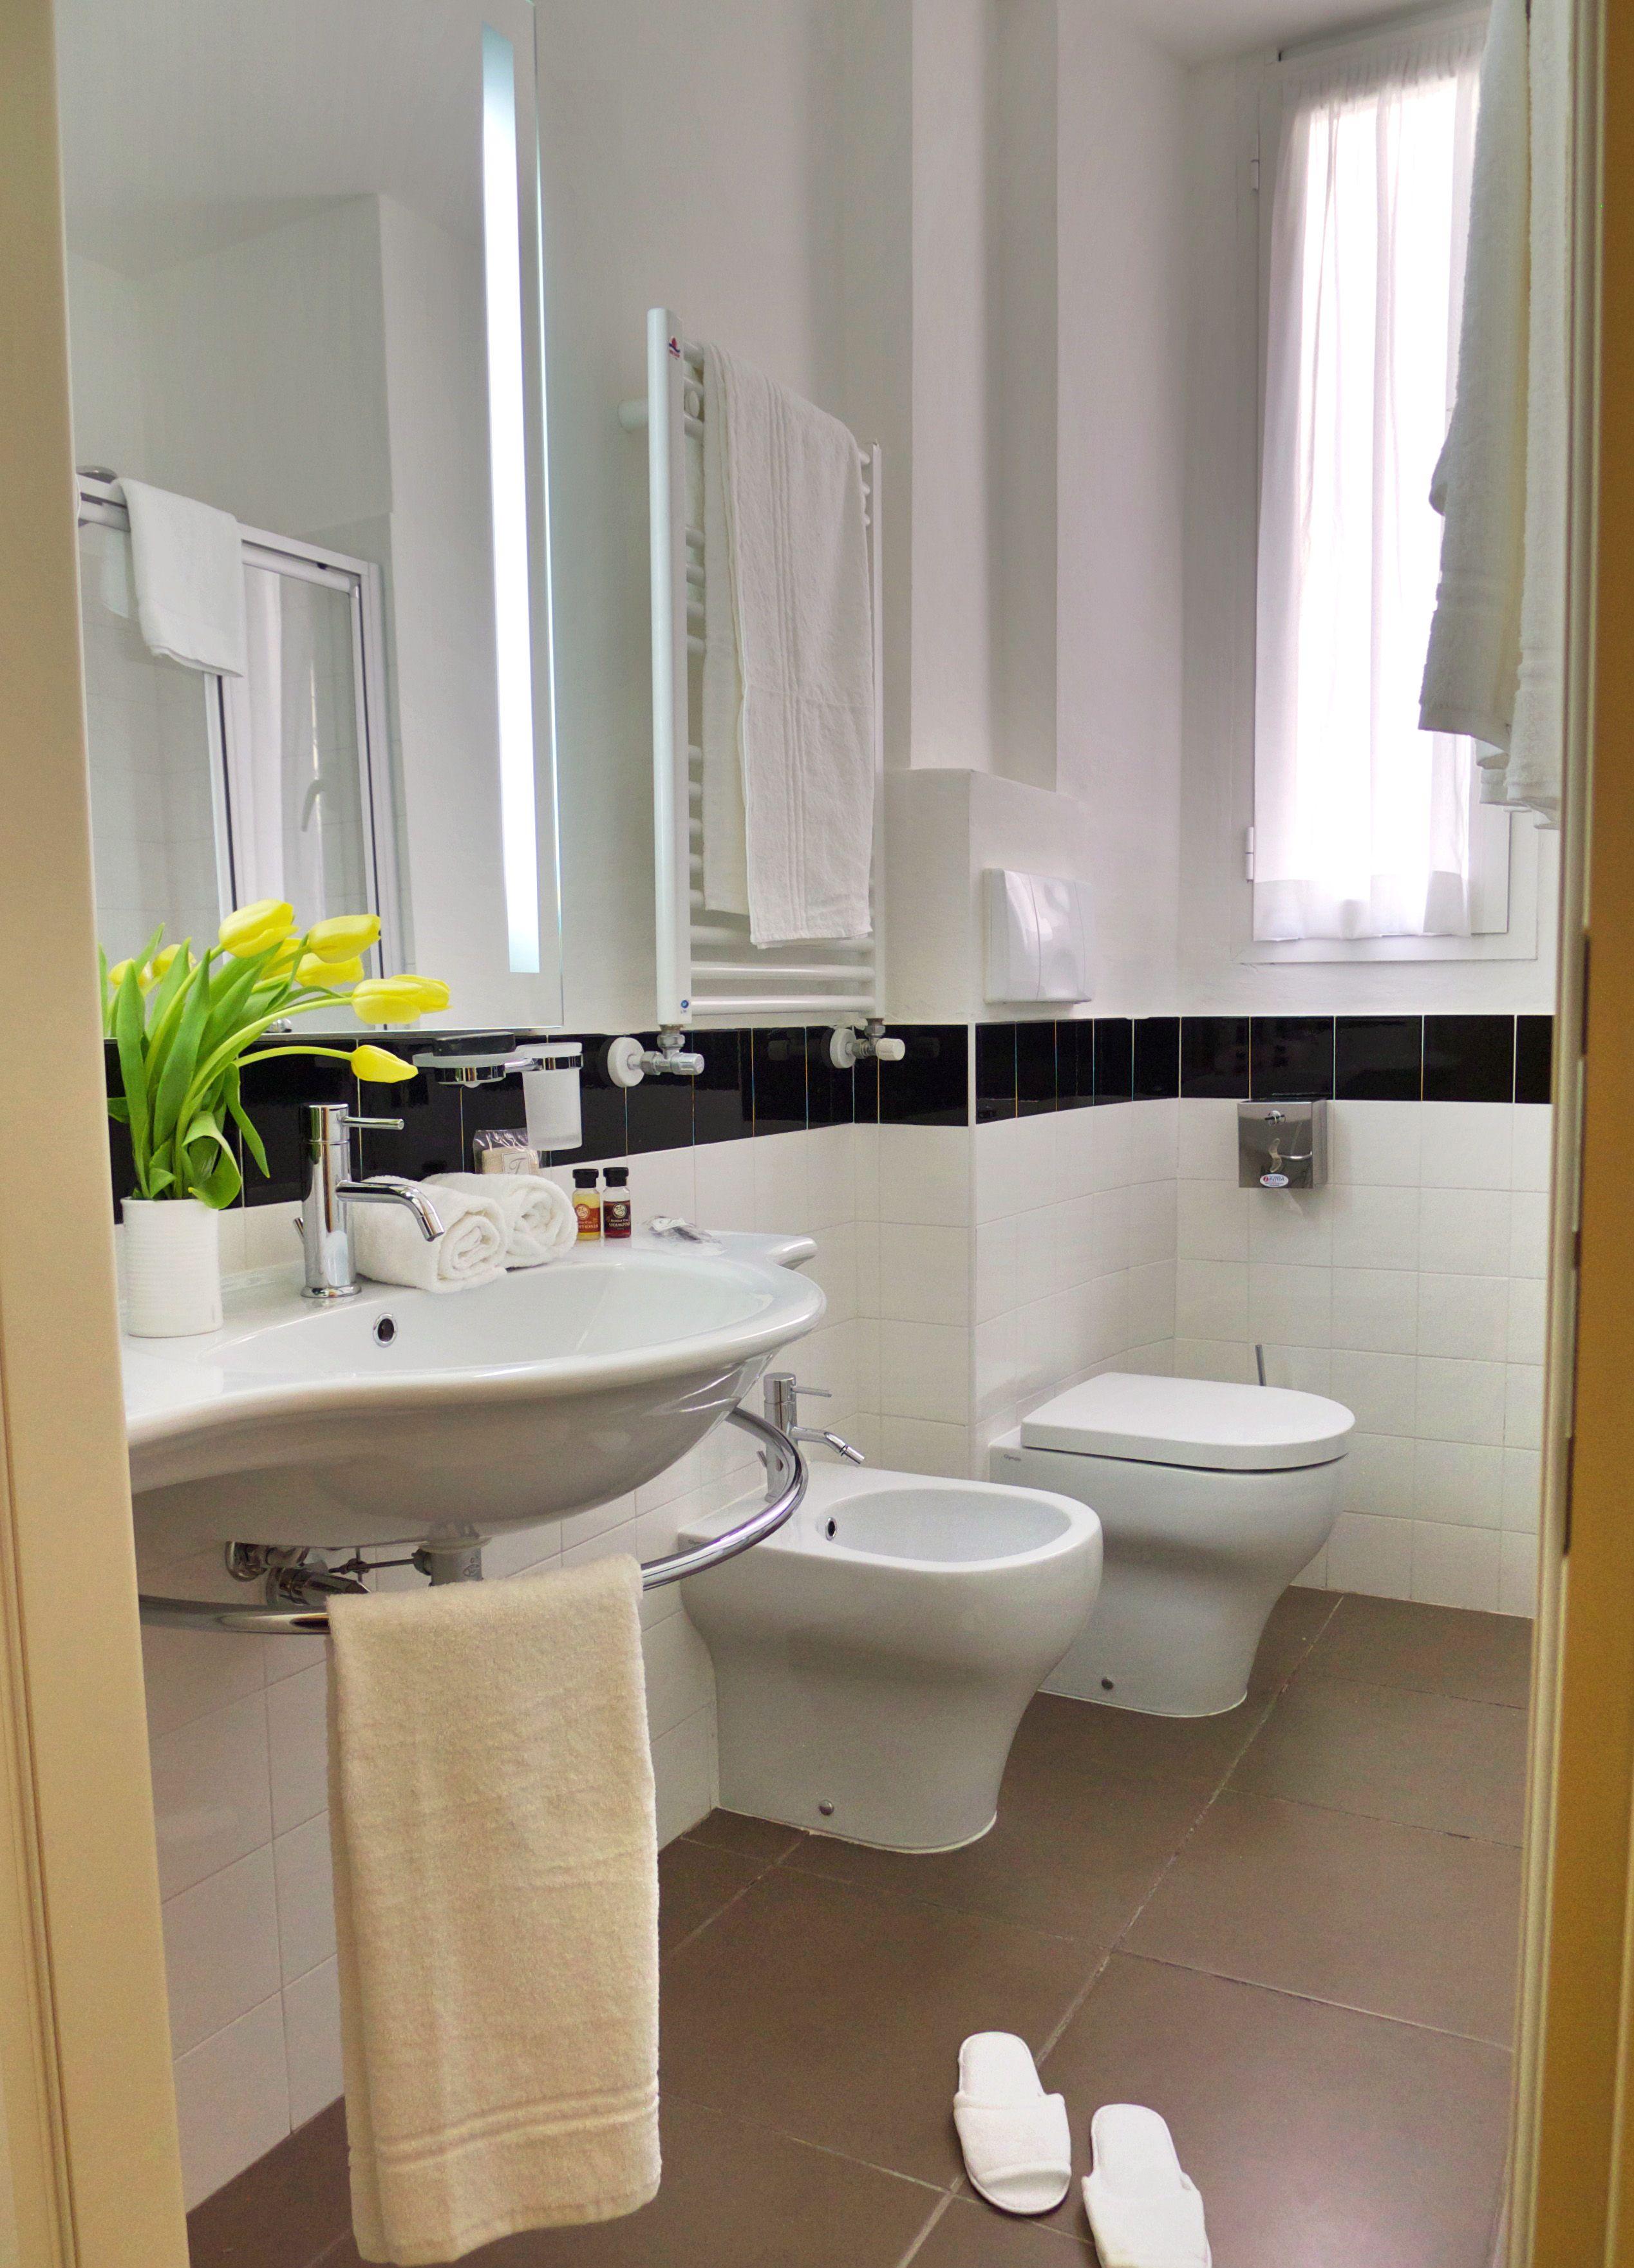 Ferton hotel toilet